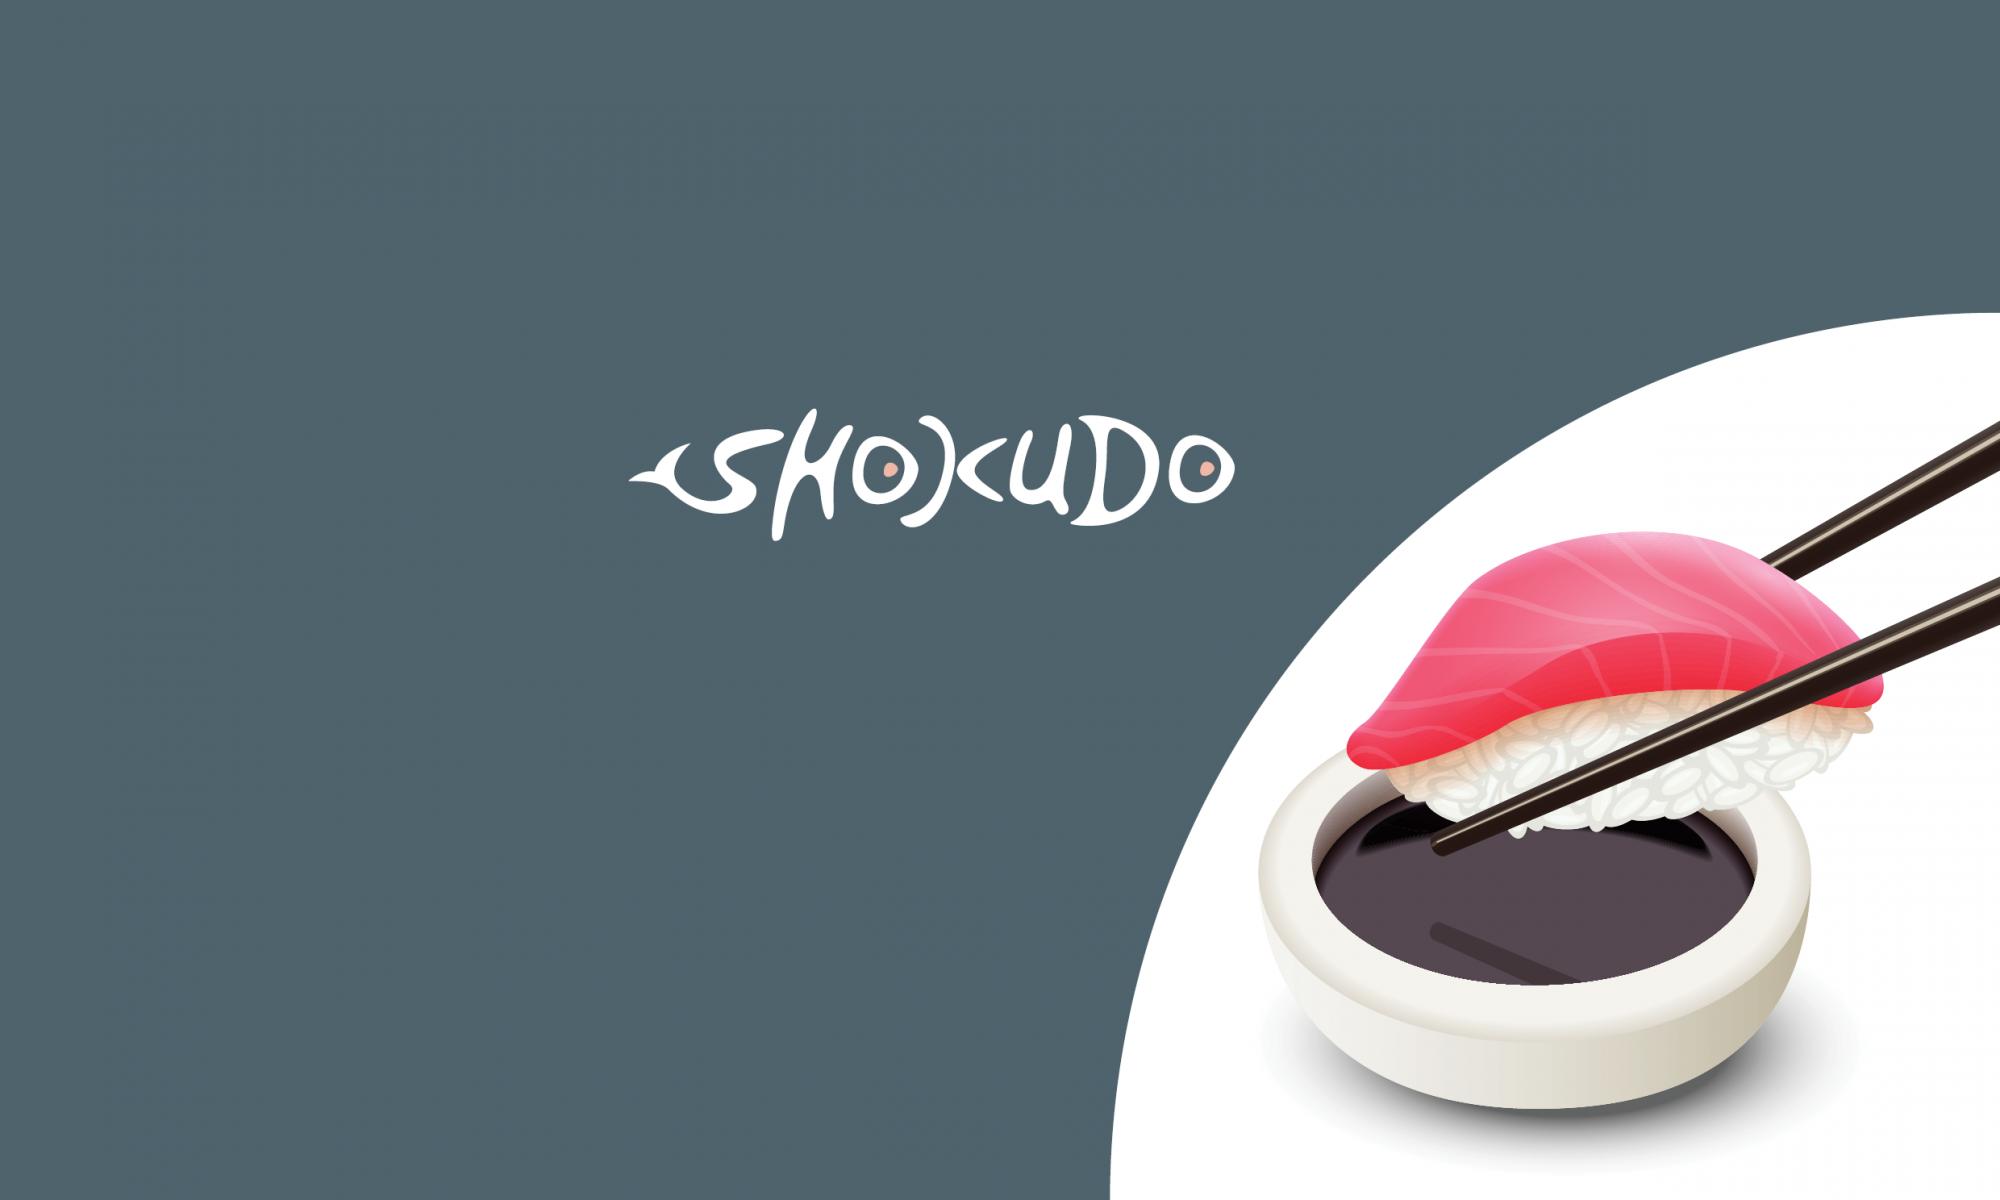 SHOKUDO